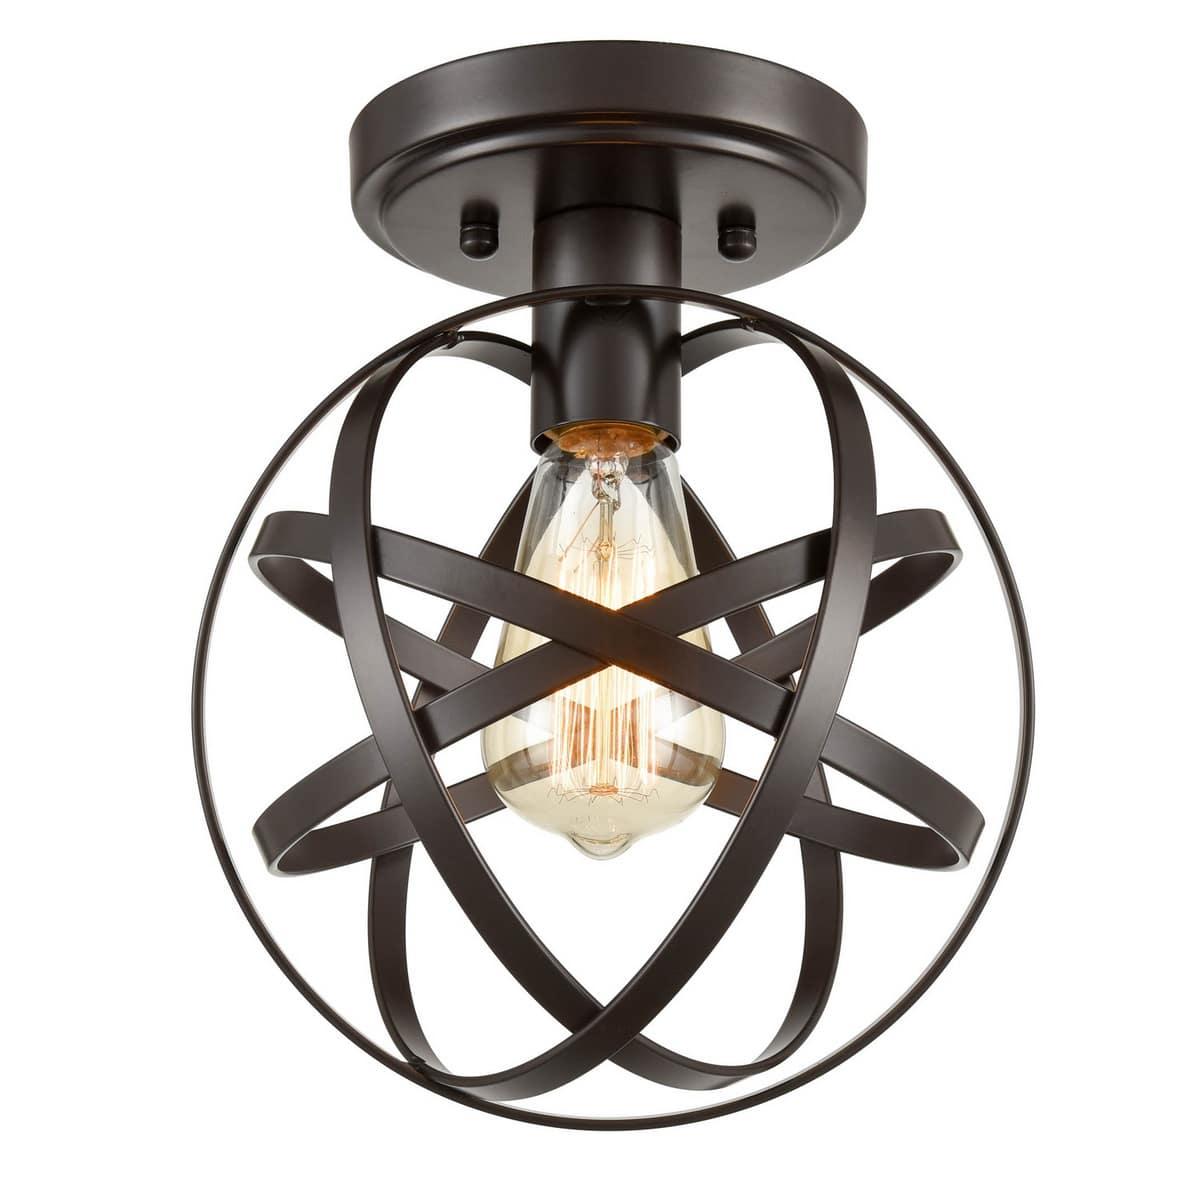 Industrial Bronze Mini Ceiling Light Metal Globe Hallway Fixture